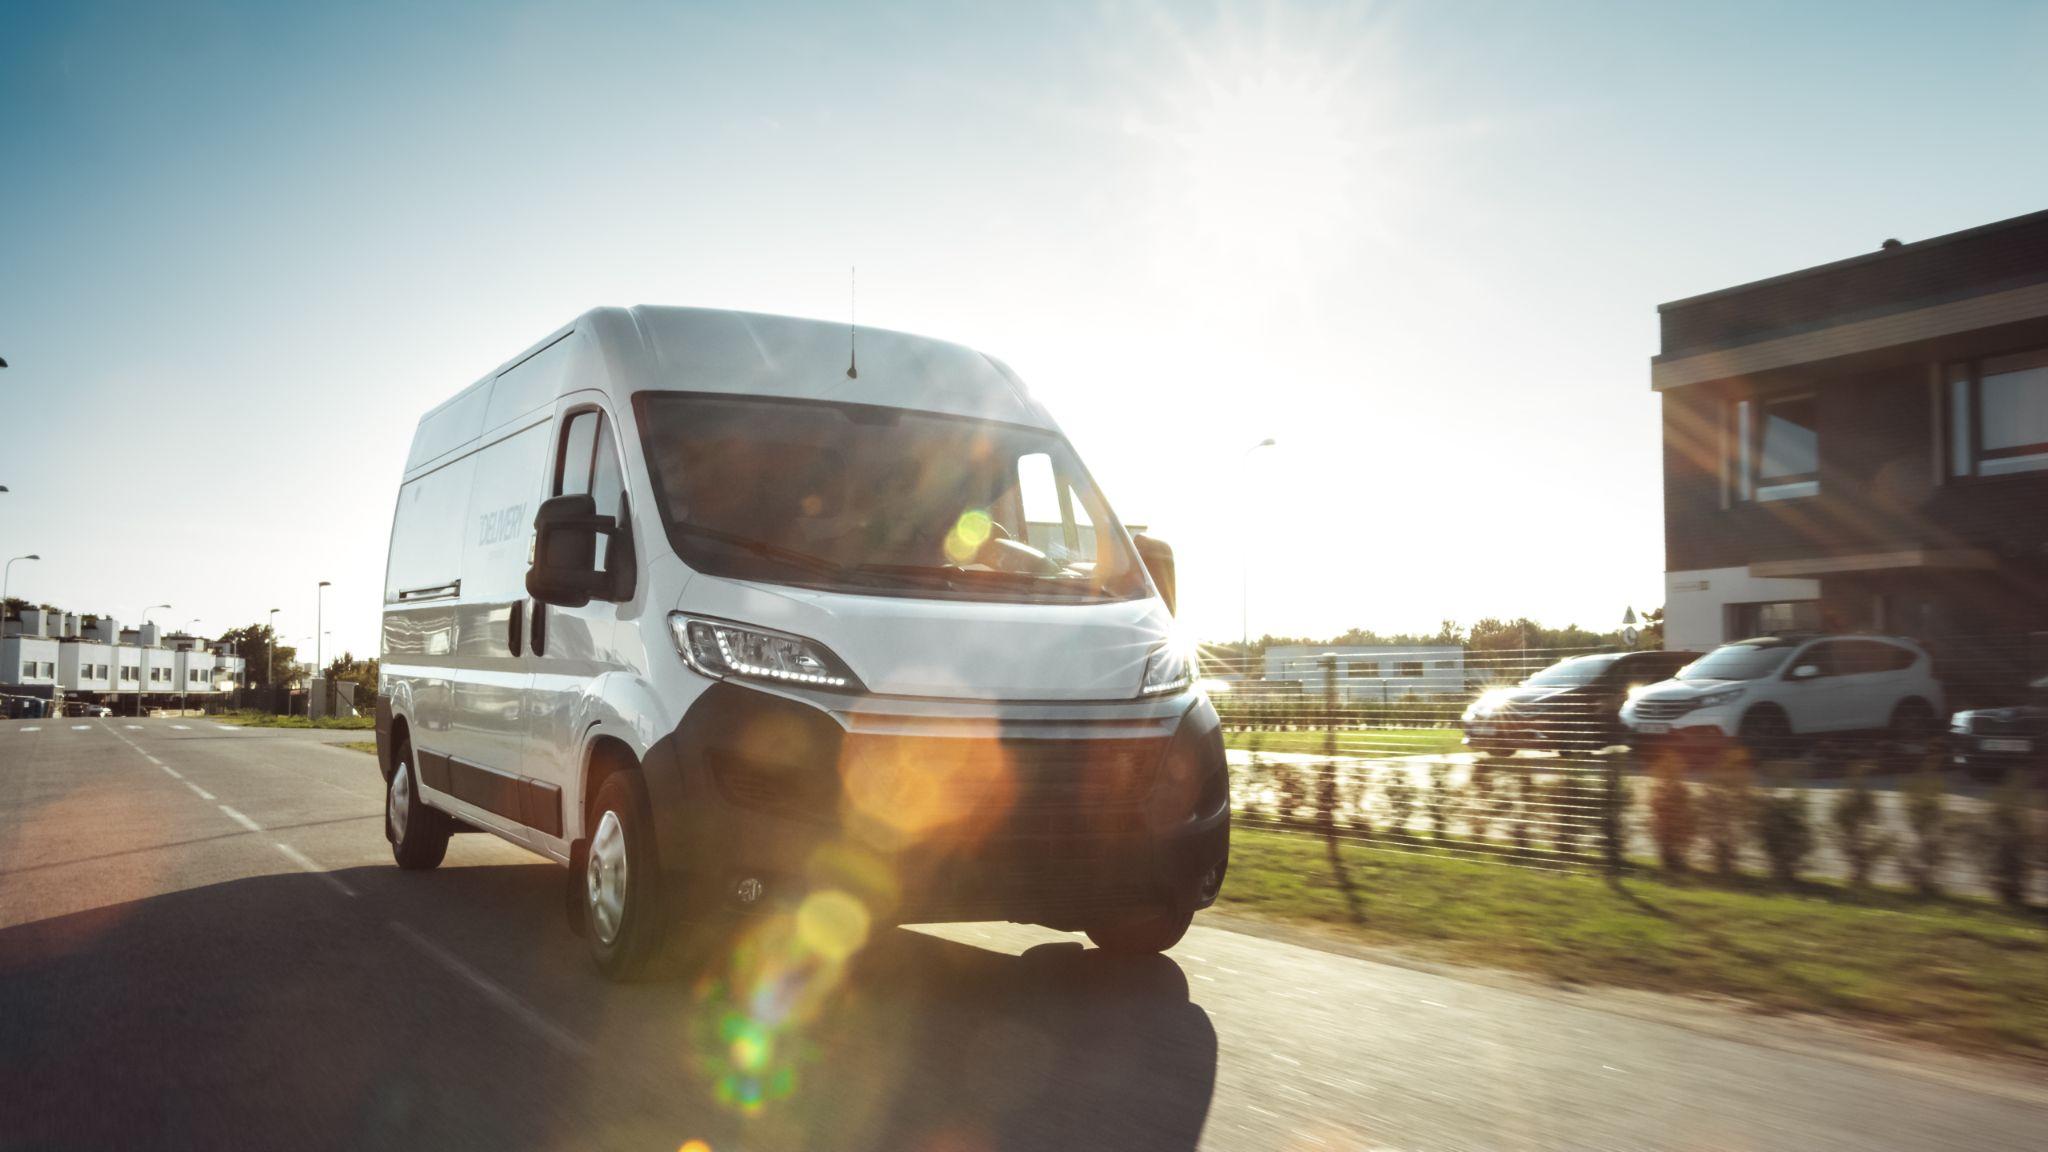 A new delivery van